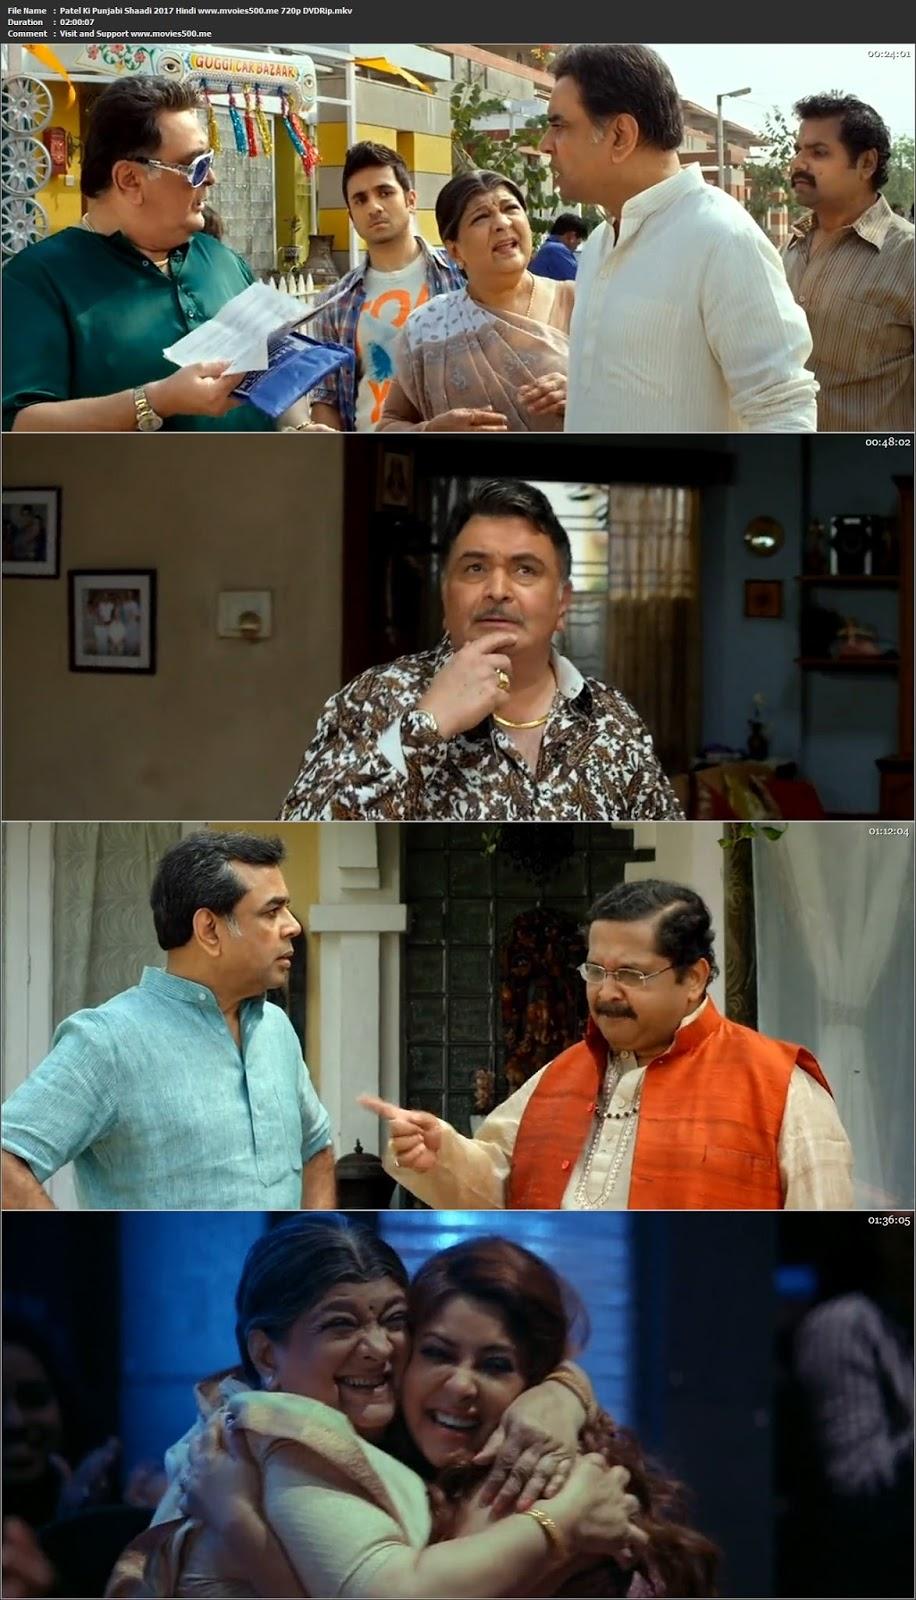 Patel Ki Punjabi Shaadi 2017 Punjabi Full Movie DVDRip 720p at 9966132.com